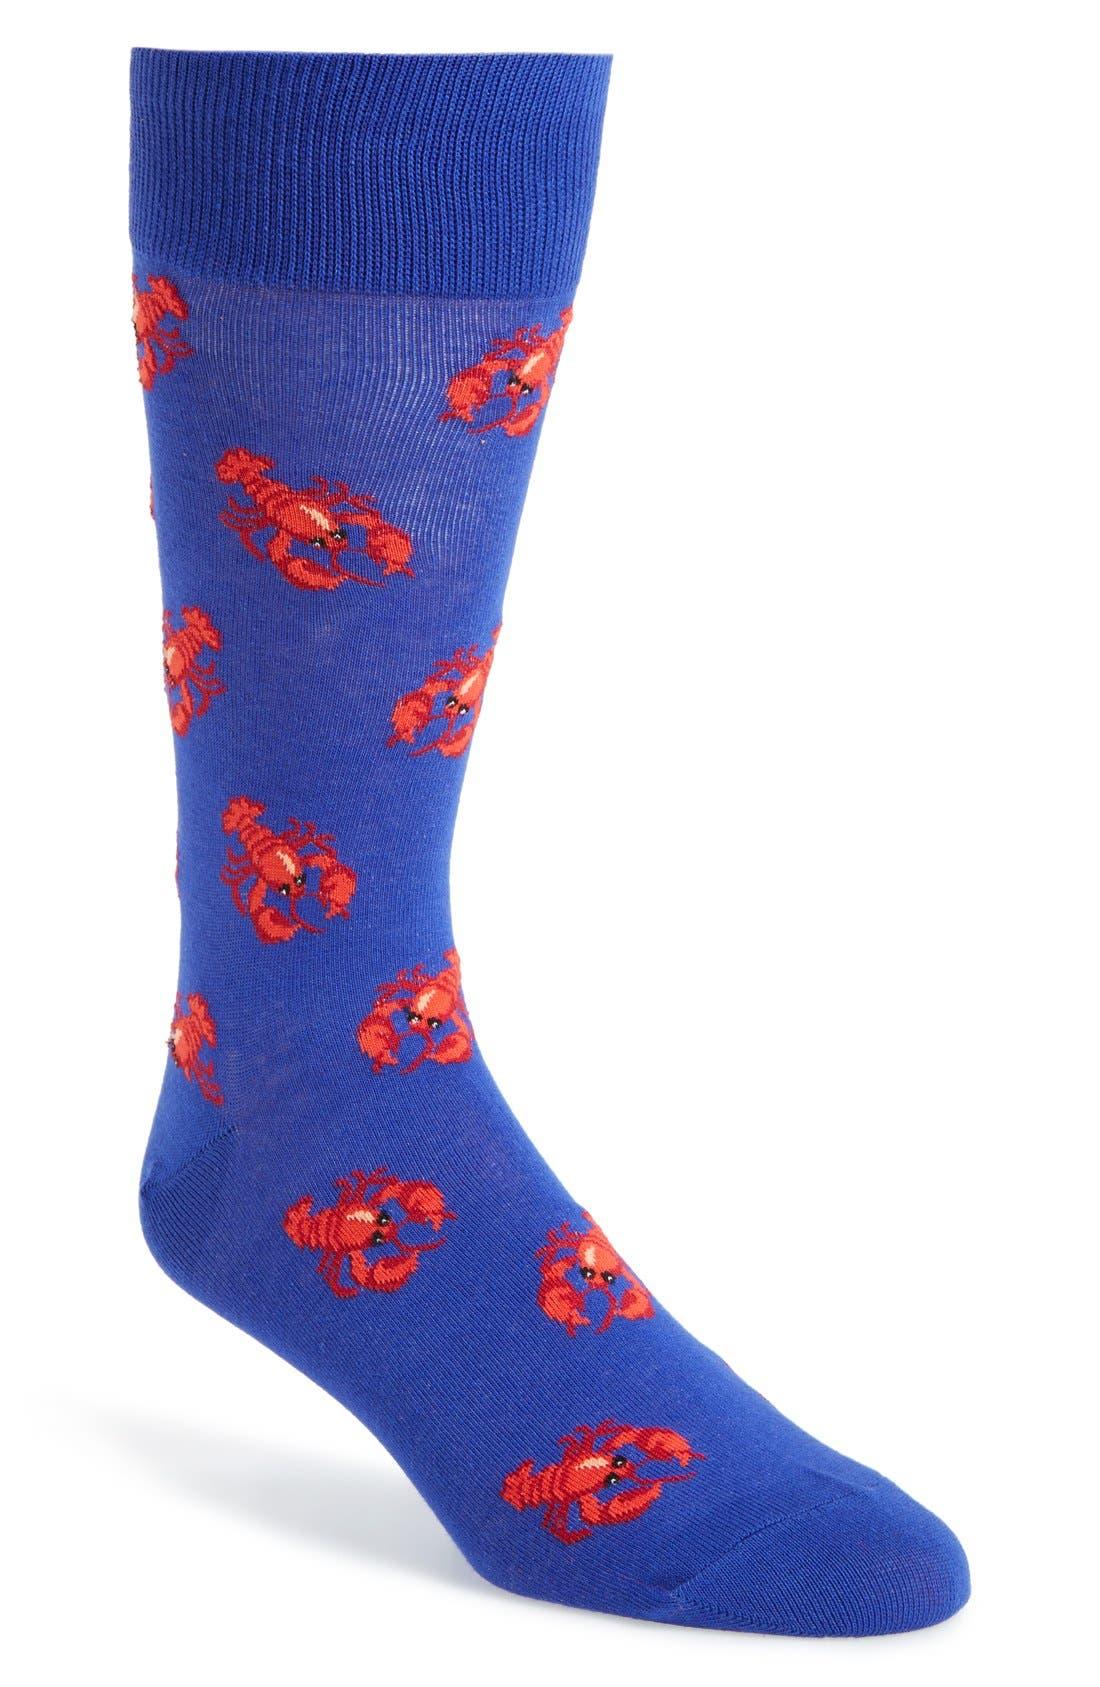 Main Image - Hot Sox 'Lobster' Socks